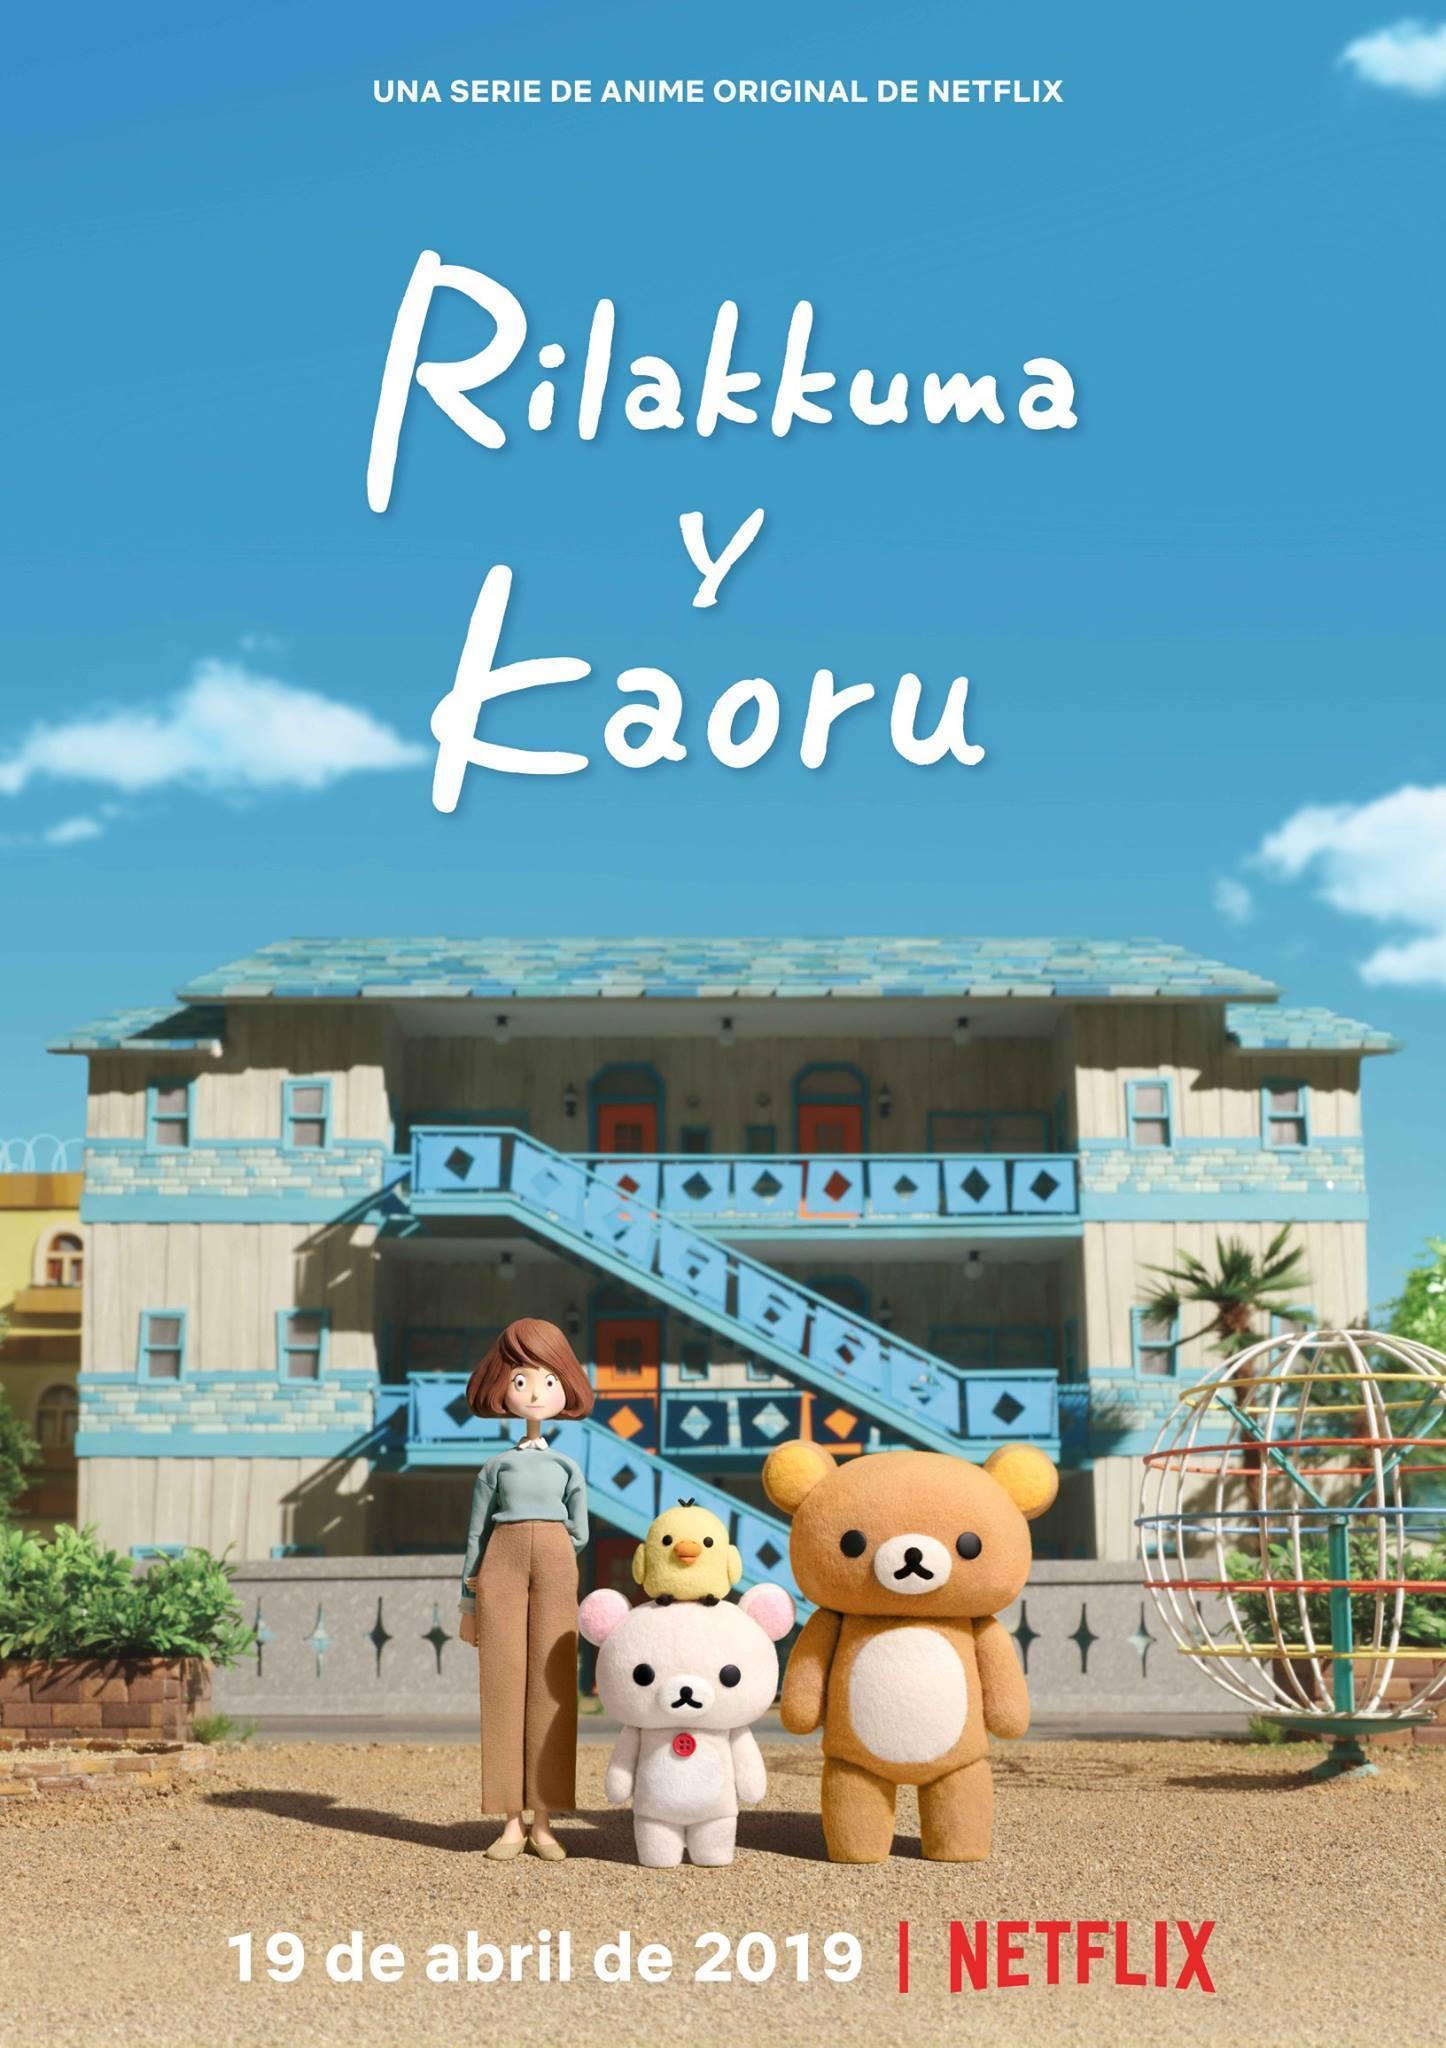 Rilakkuma y Kaoru Poster.jpg